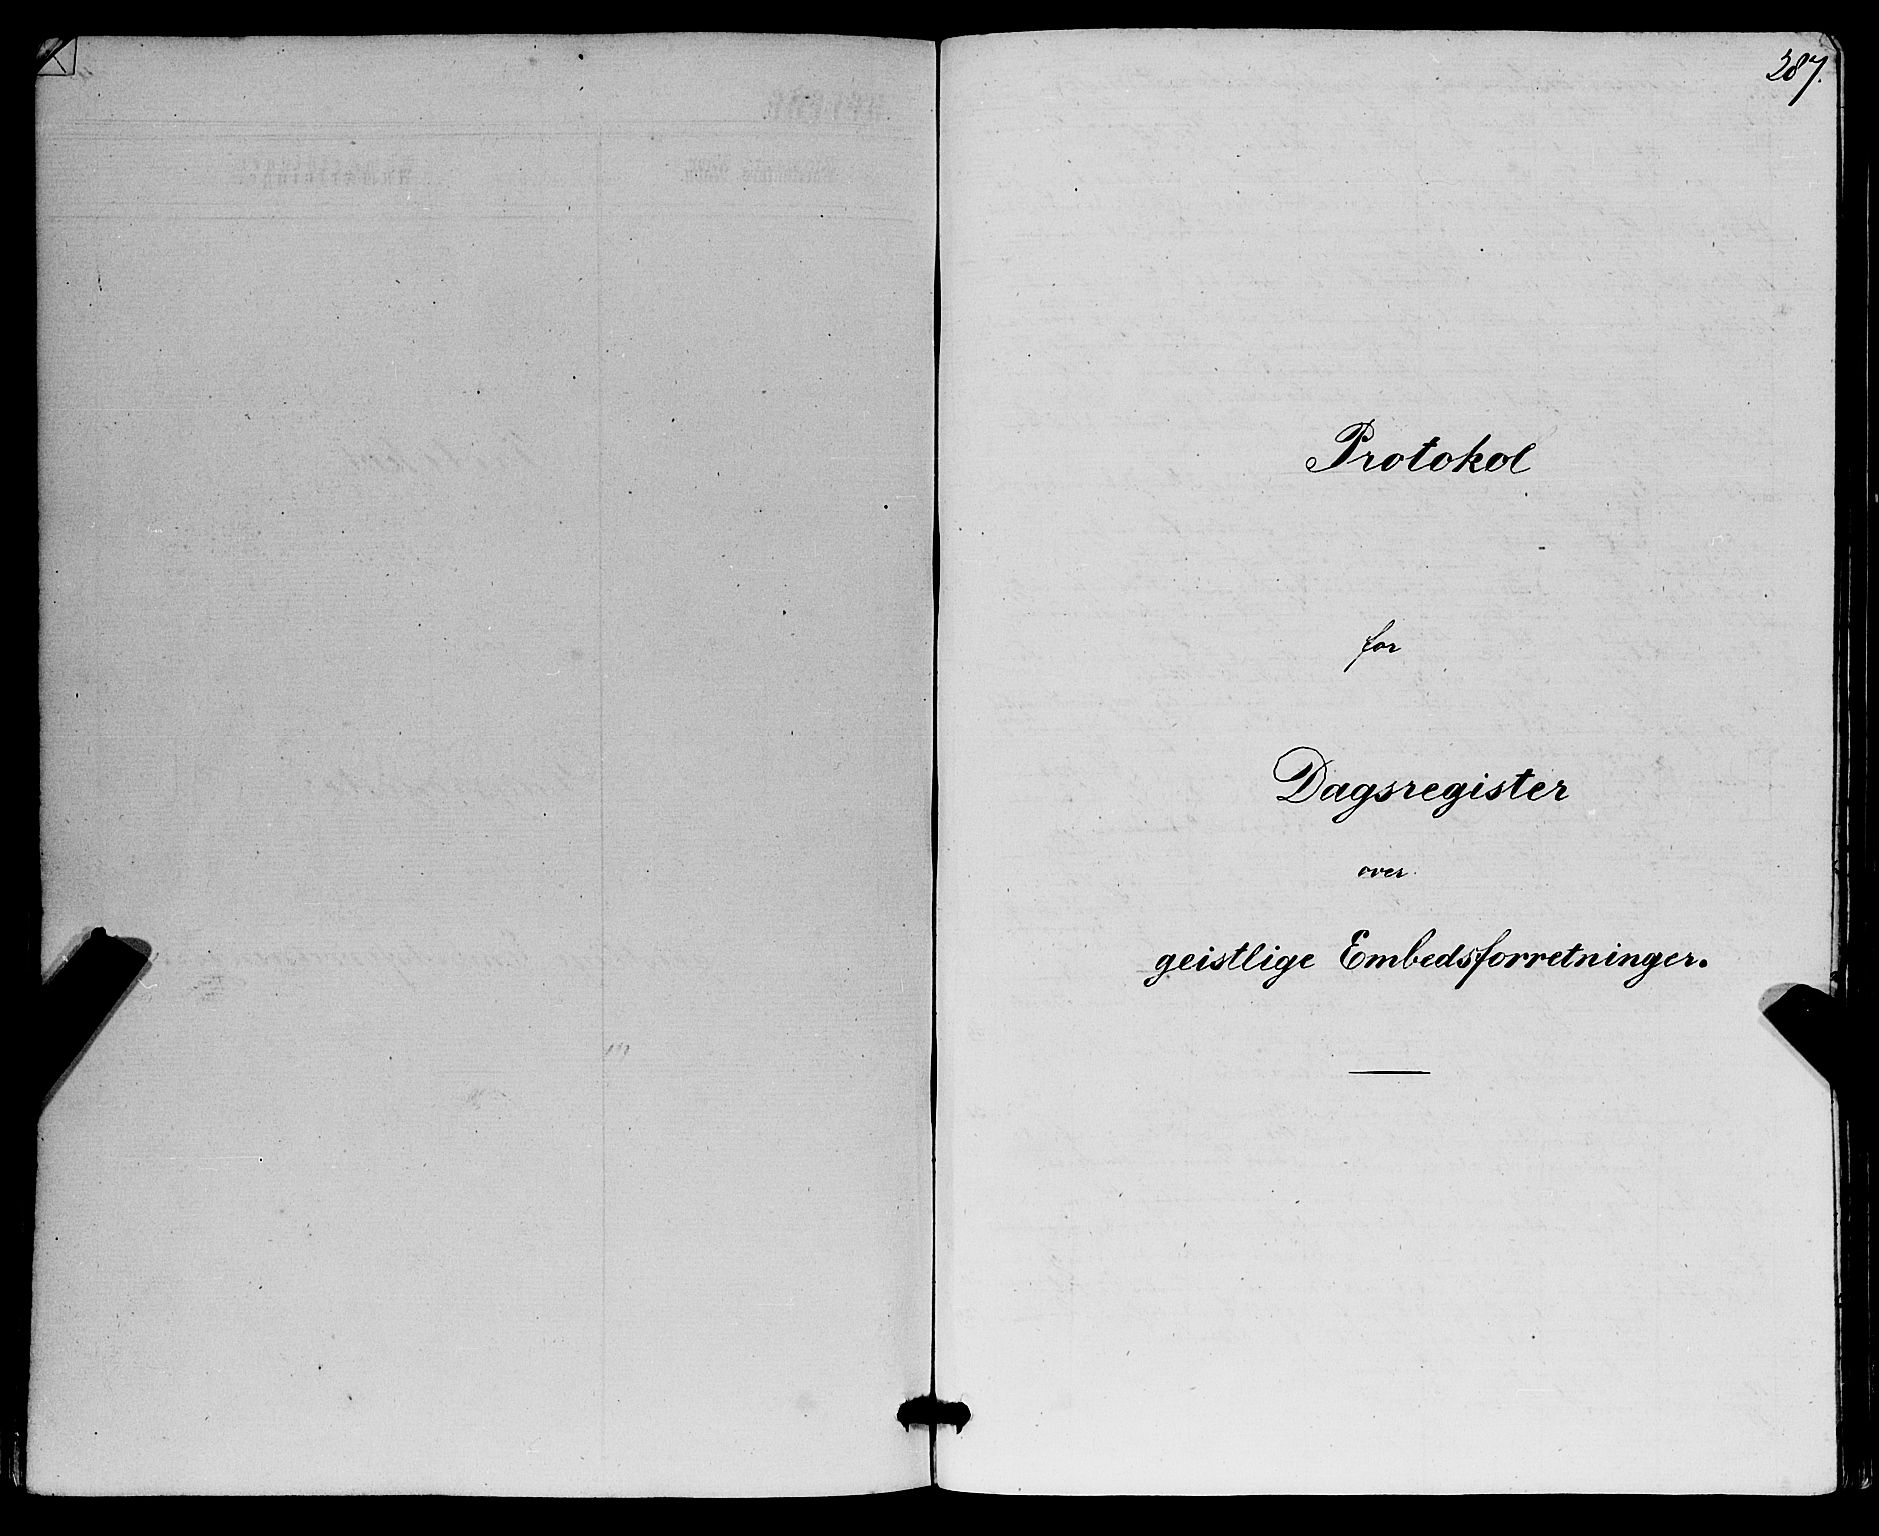 SAB, Finnås sokneprestembete, H/Ha/Haa/Haaa/L0008: Ministerialbok nr. A 8, 1863-1872, s. 287